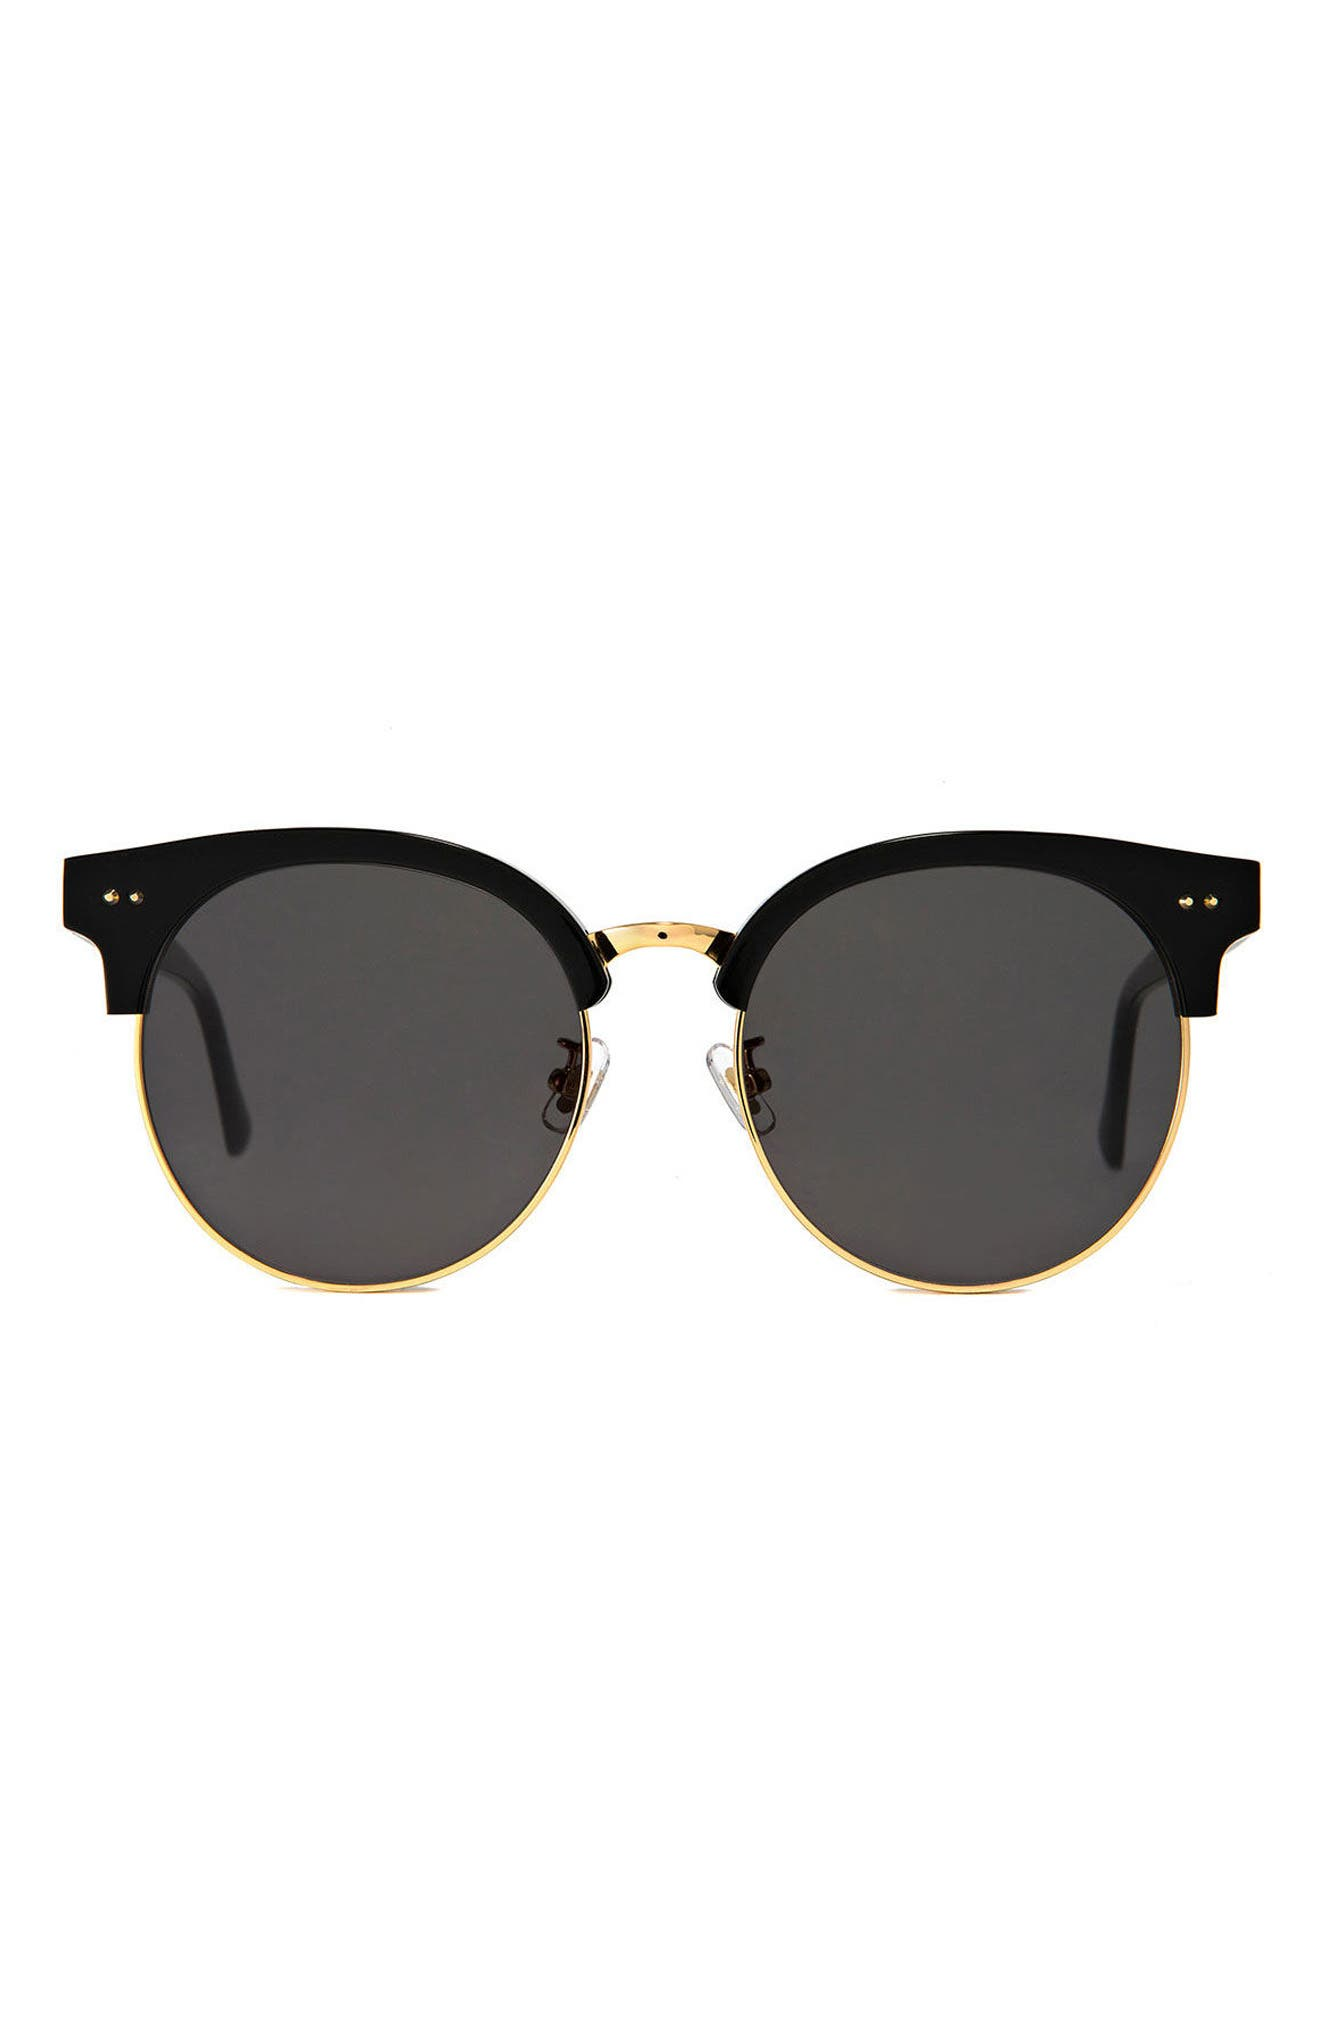 Moon Cut 55mm Sunglasses,                             Main thumbnail 1, color,                             001